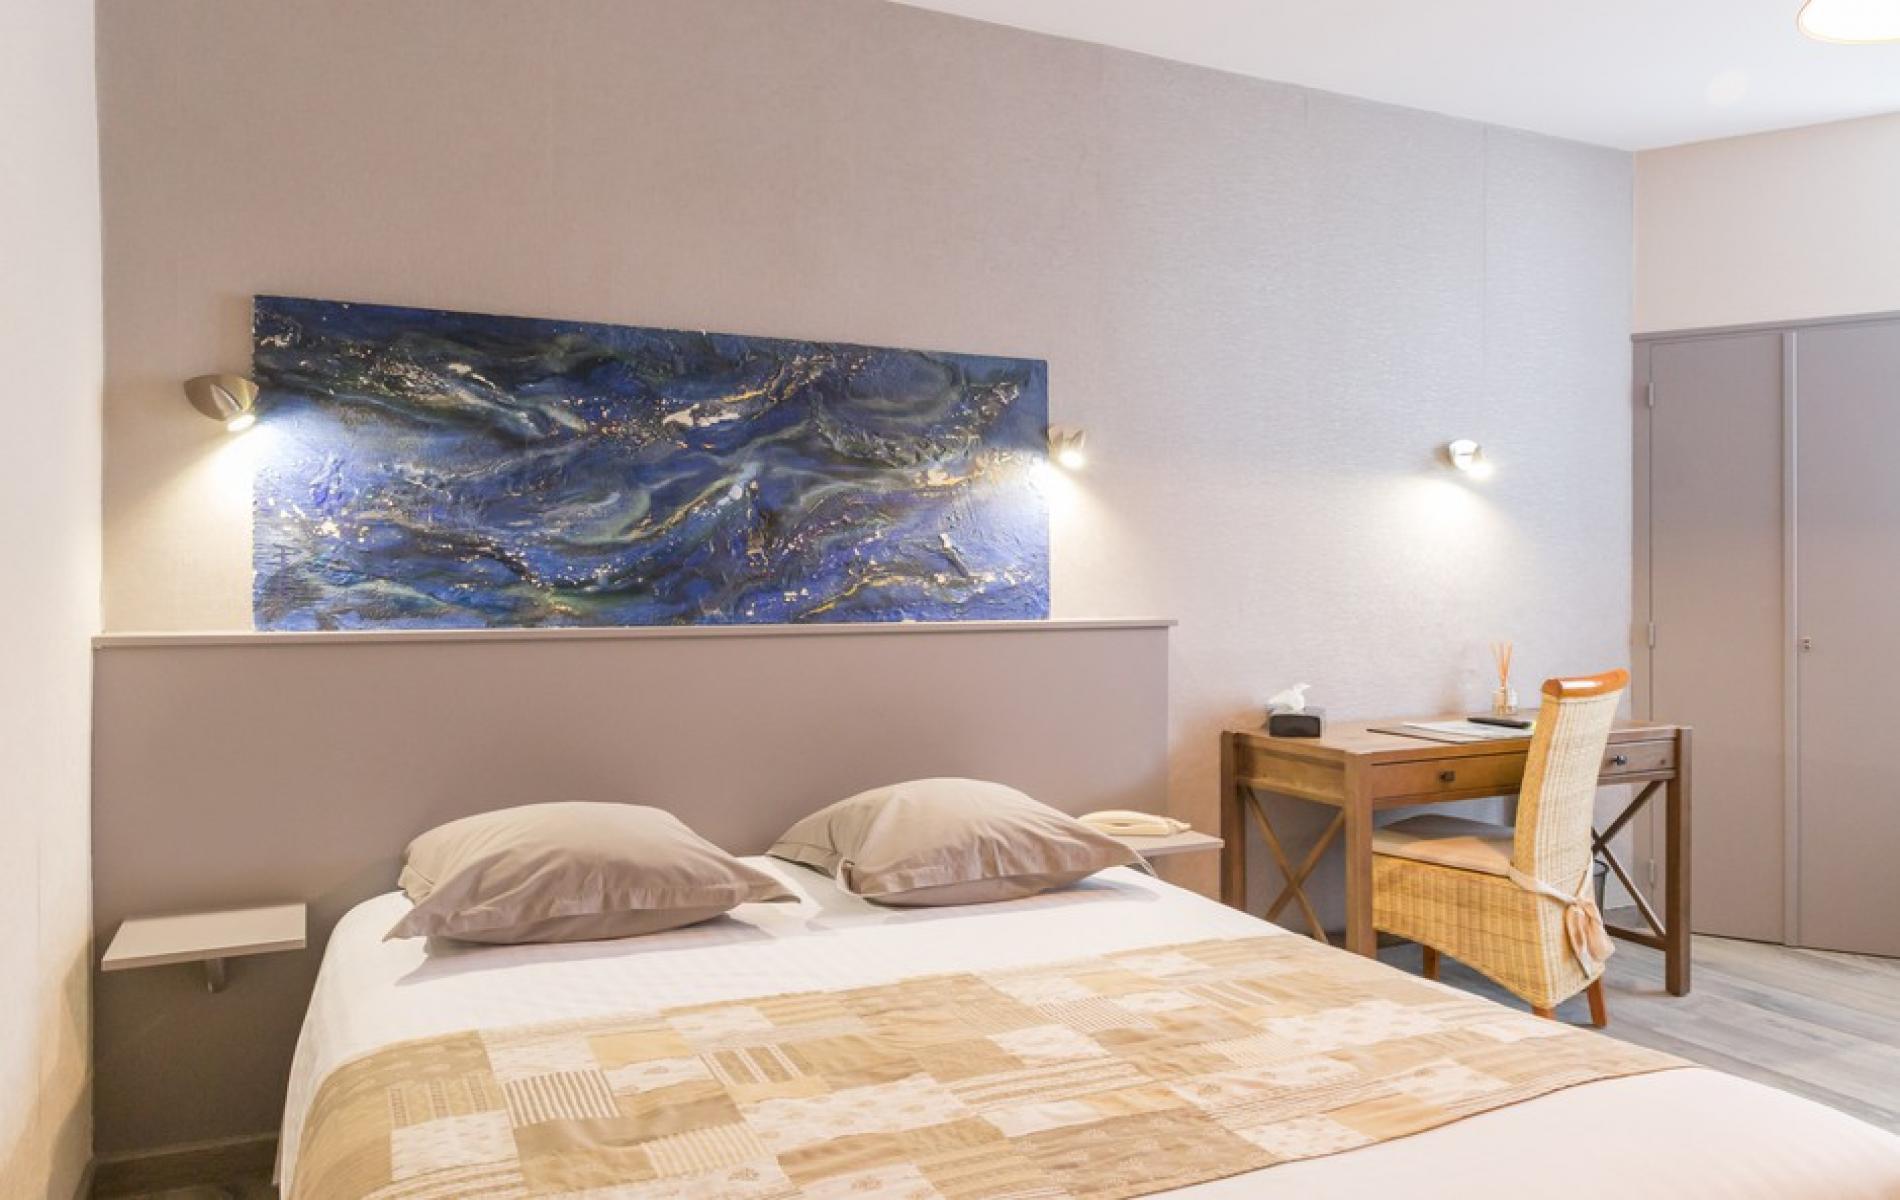 Chambre grand lit pour 1 personne